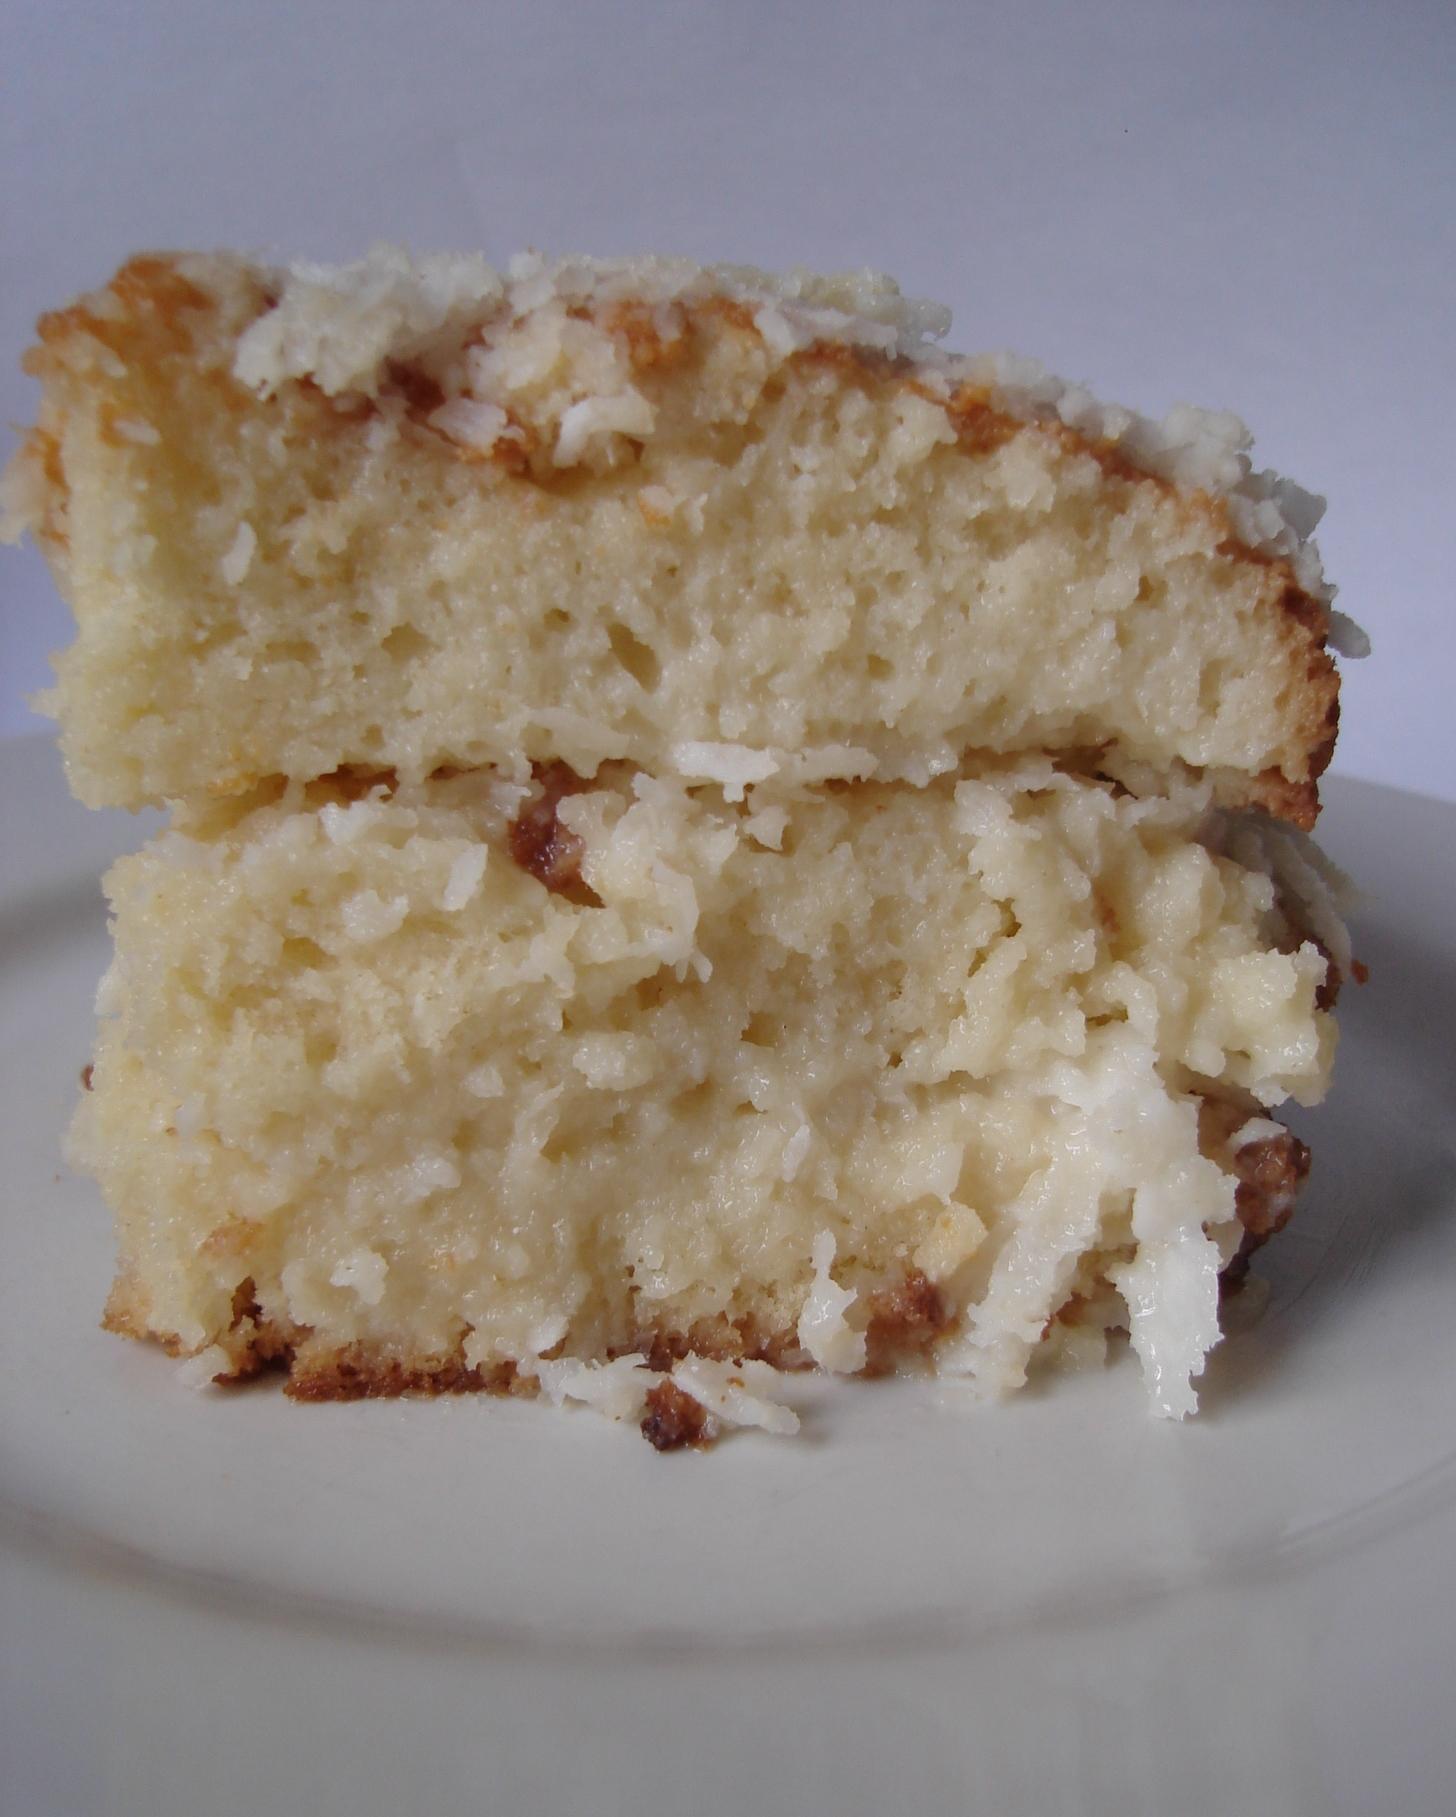 como deixar o bolo de massa pronta macio e molhado